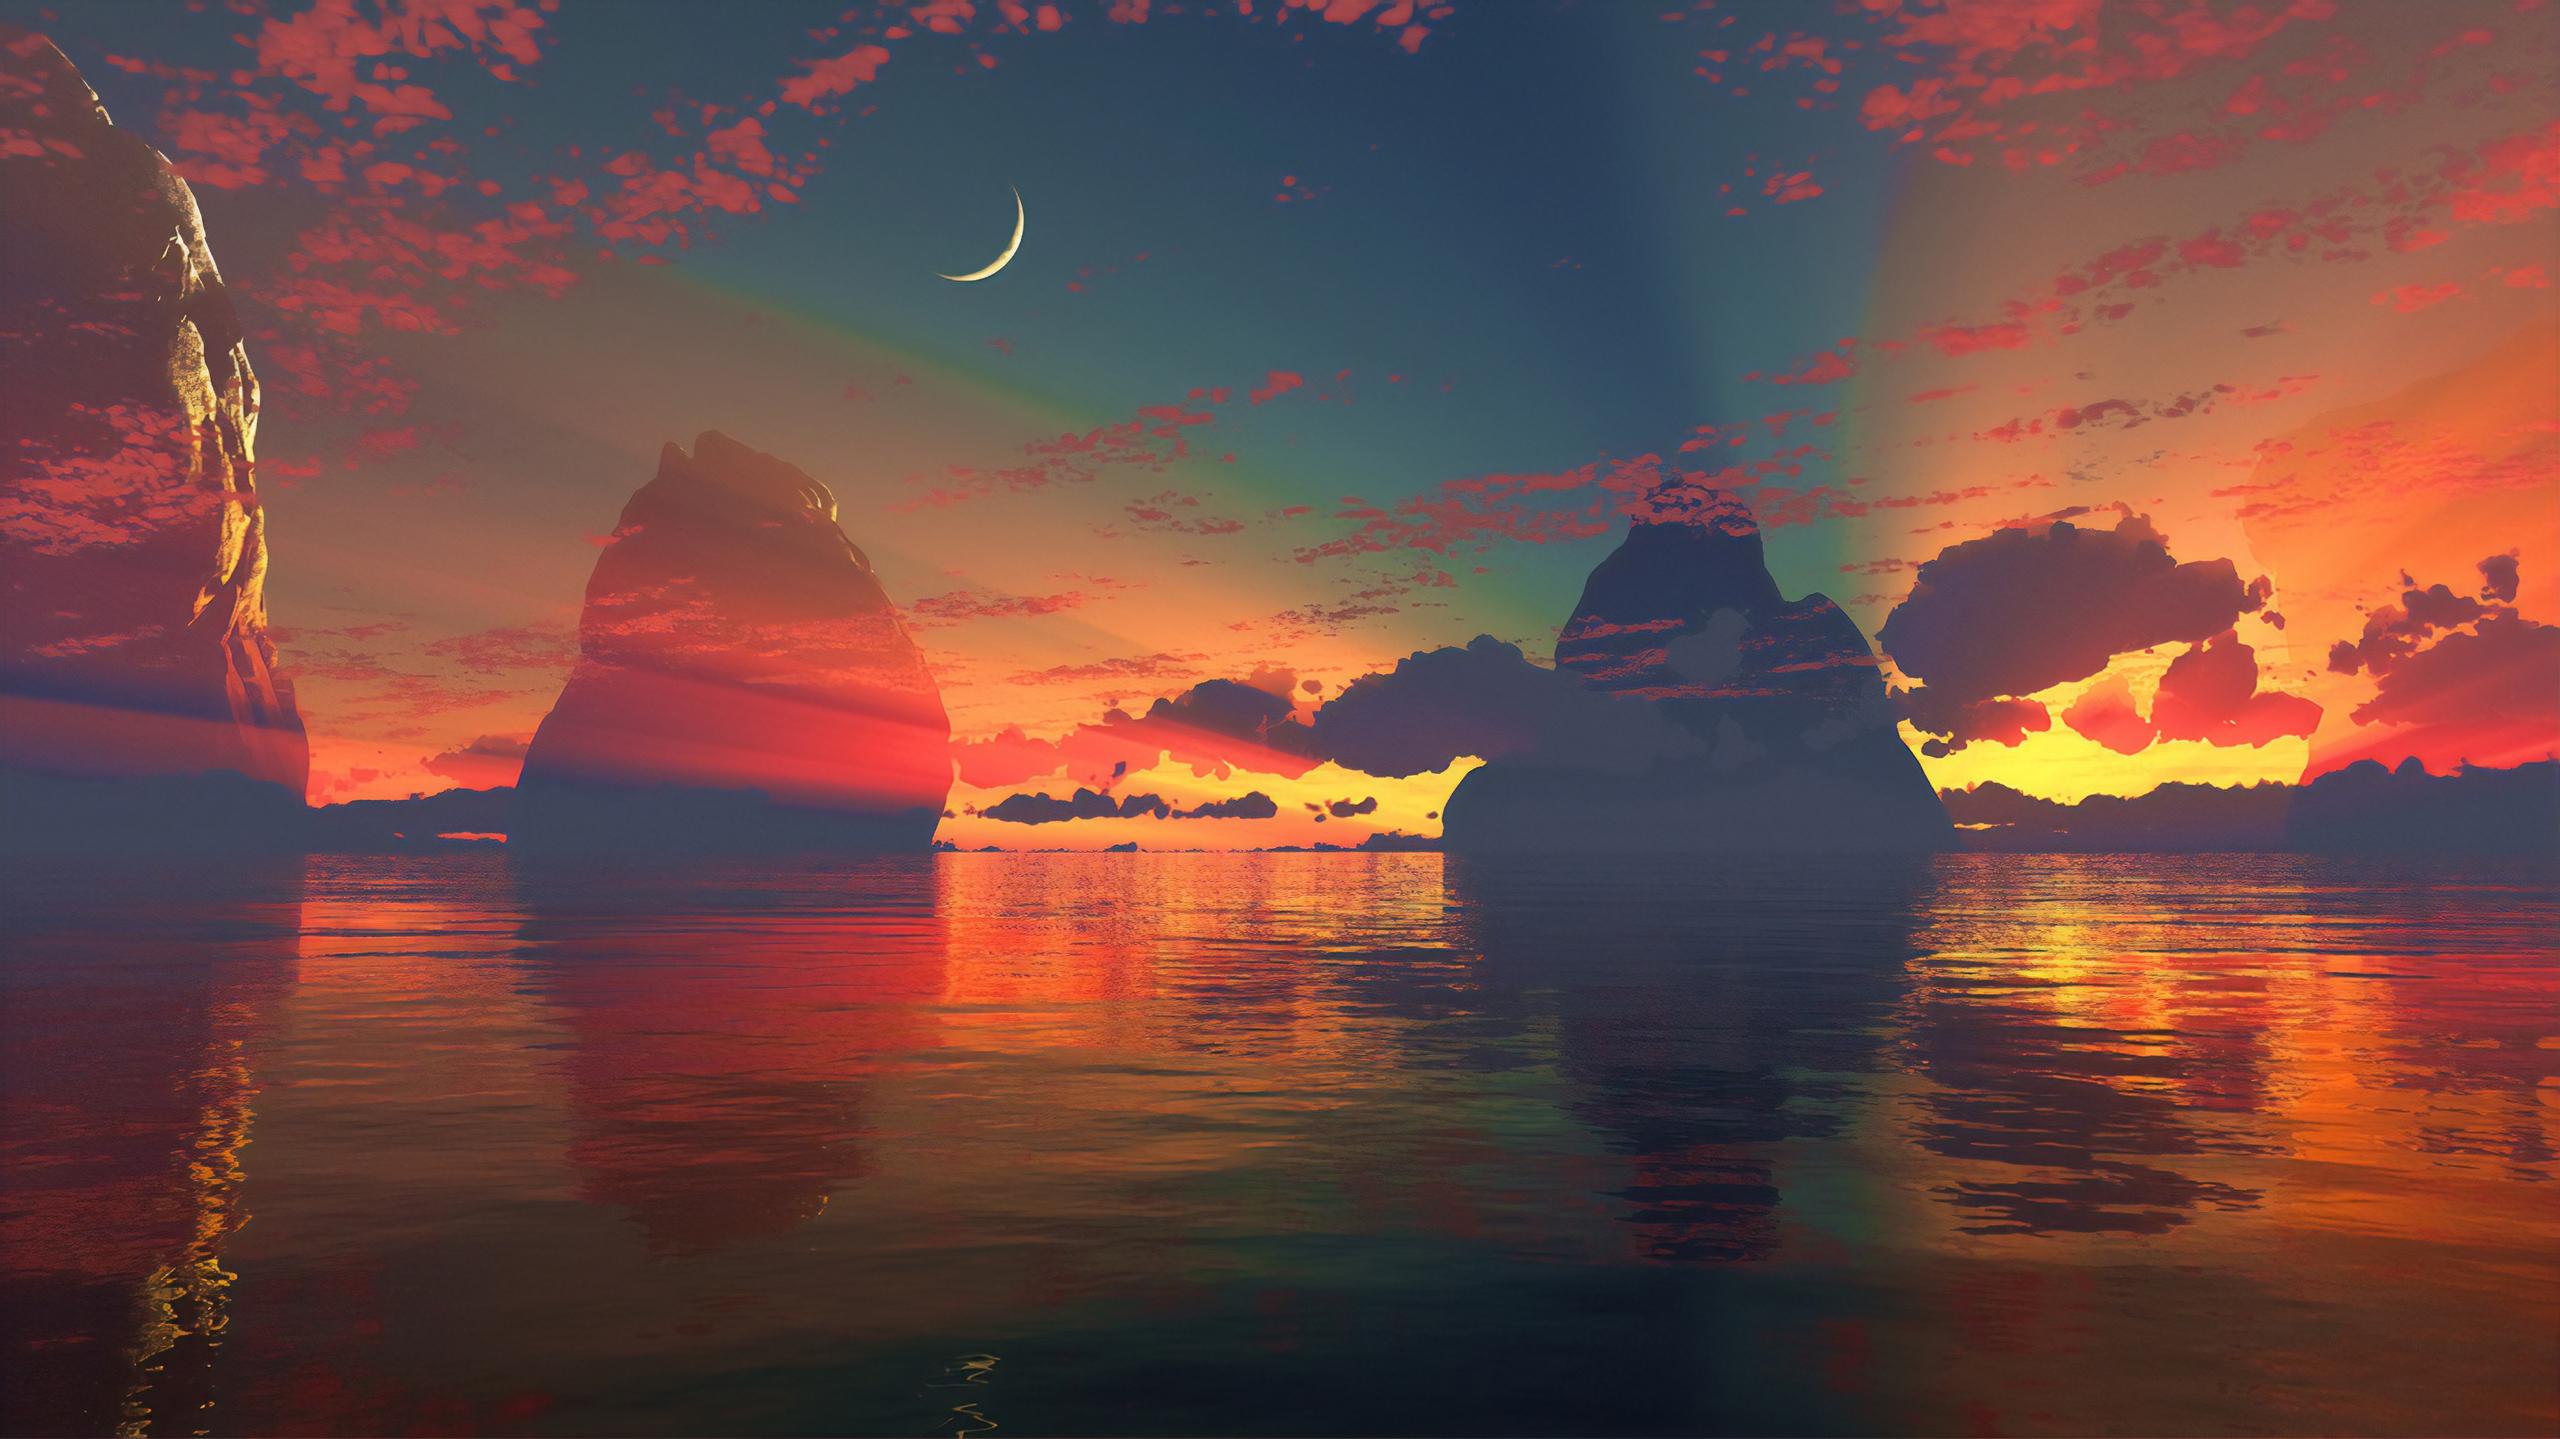 General 2560x1439 digital digital art artwork fantasy art landscape sky skyscape water sea Moon sun rays Sun sunrise sunset dusk dark clouds morning nature